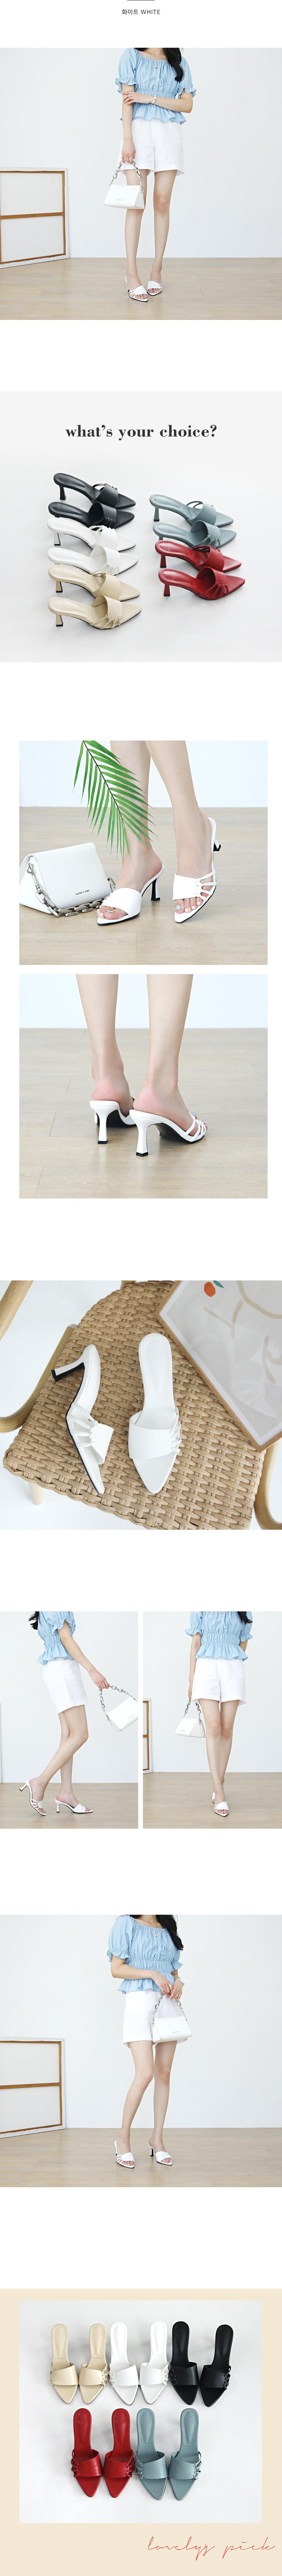 Kelly Mule slippers 7 cm